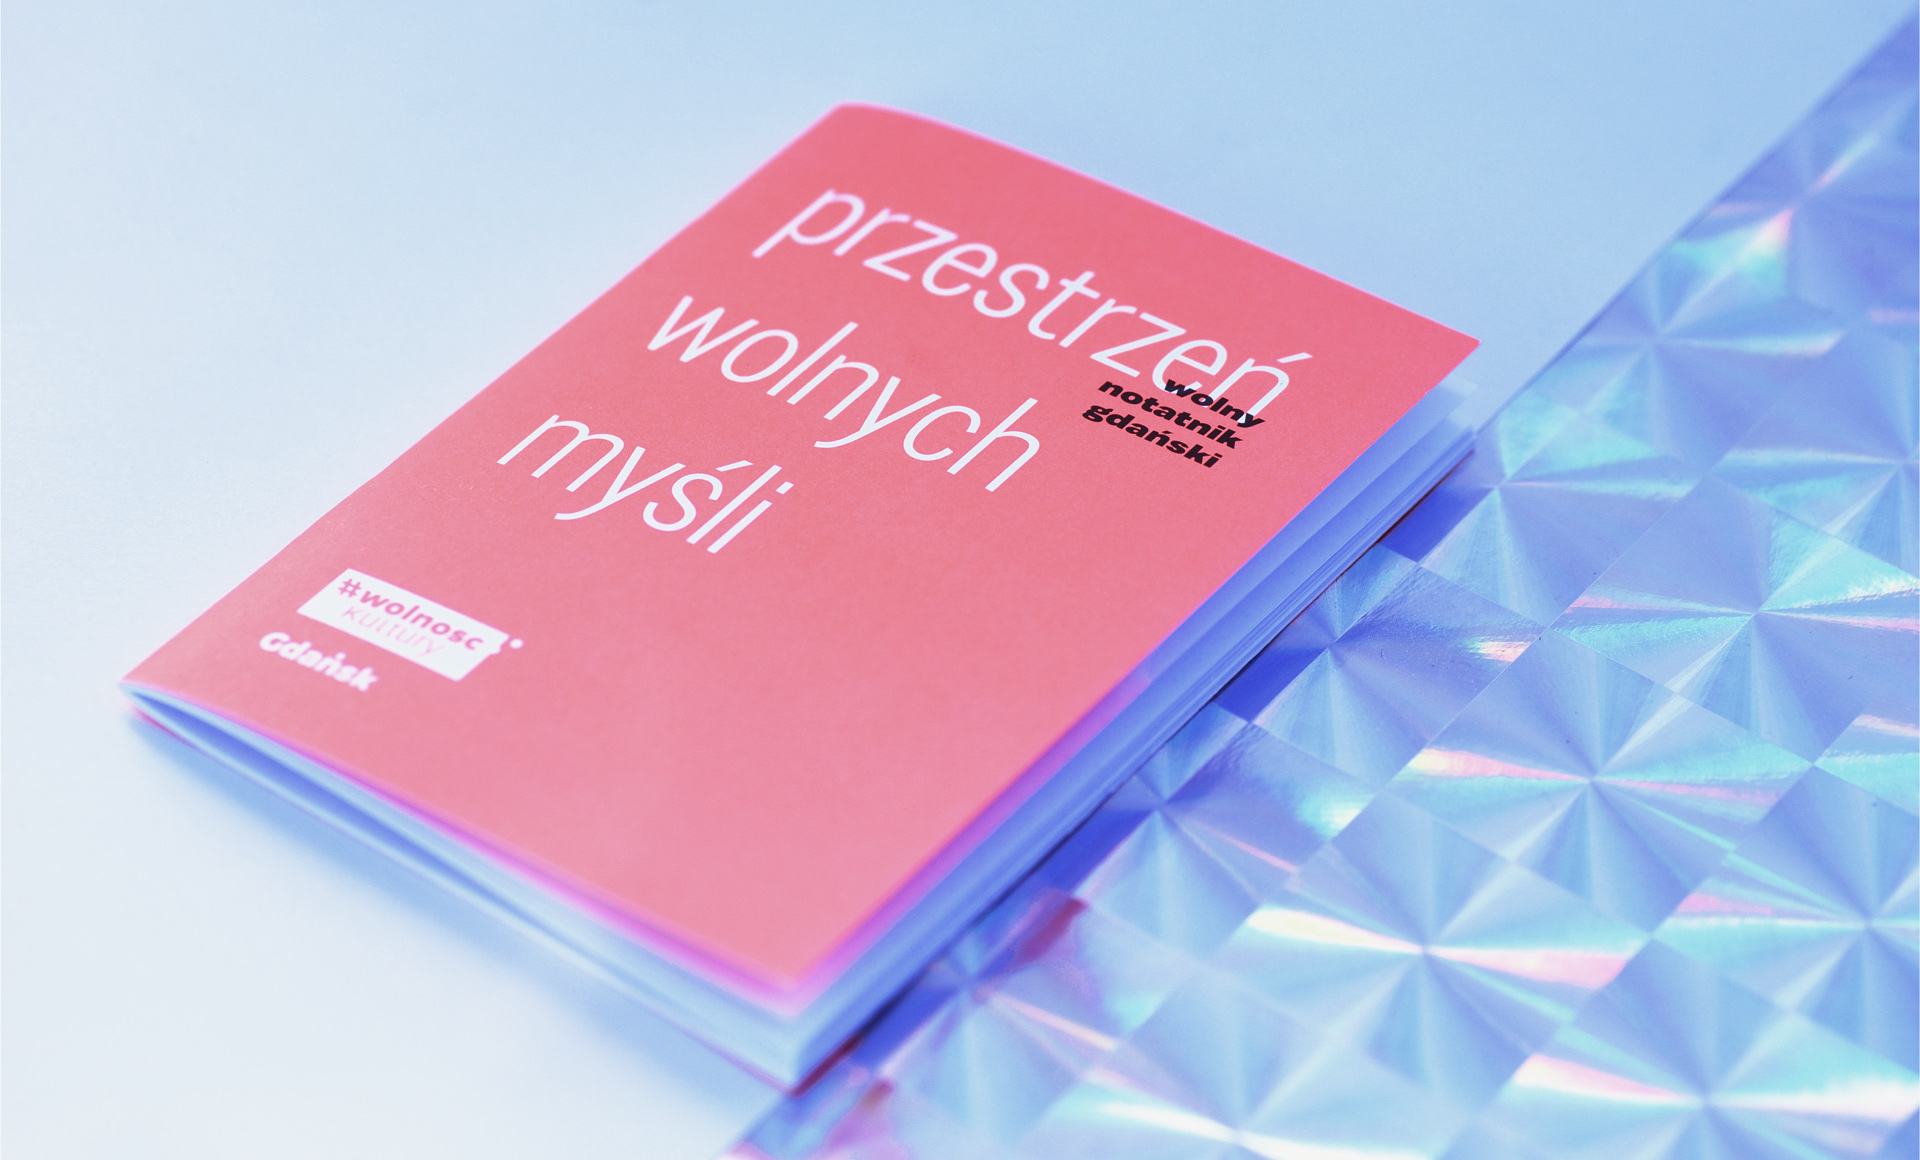 projekt notes artystyczny minimalizm typografia